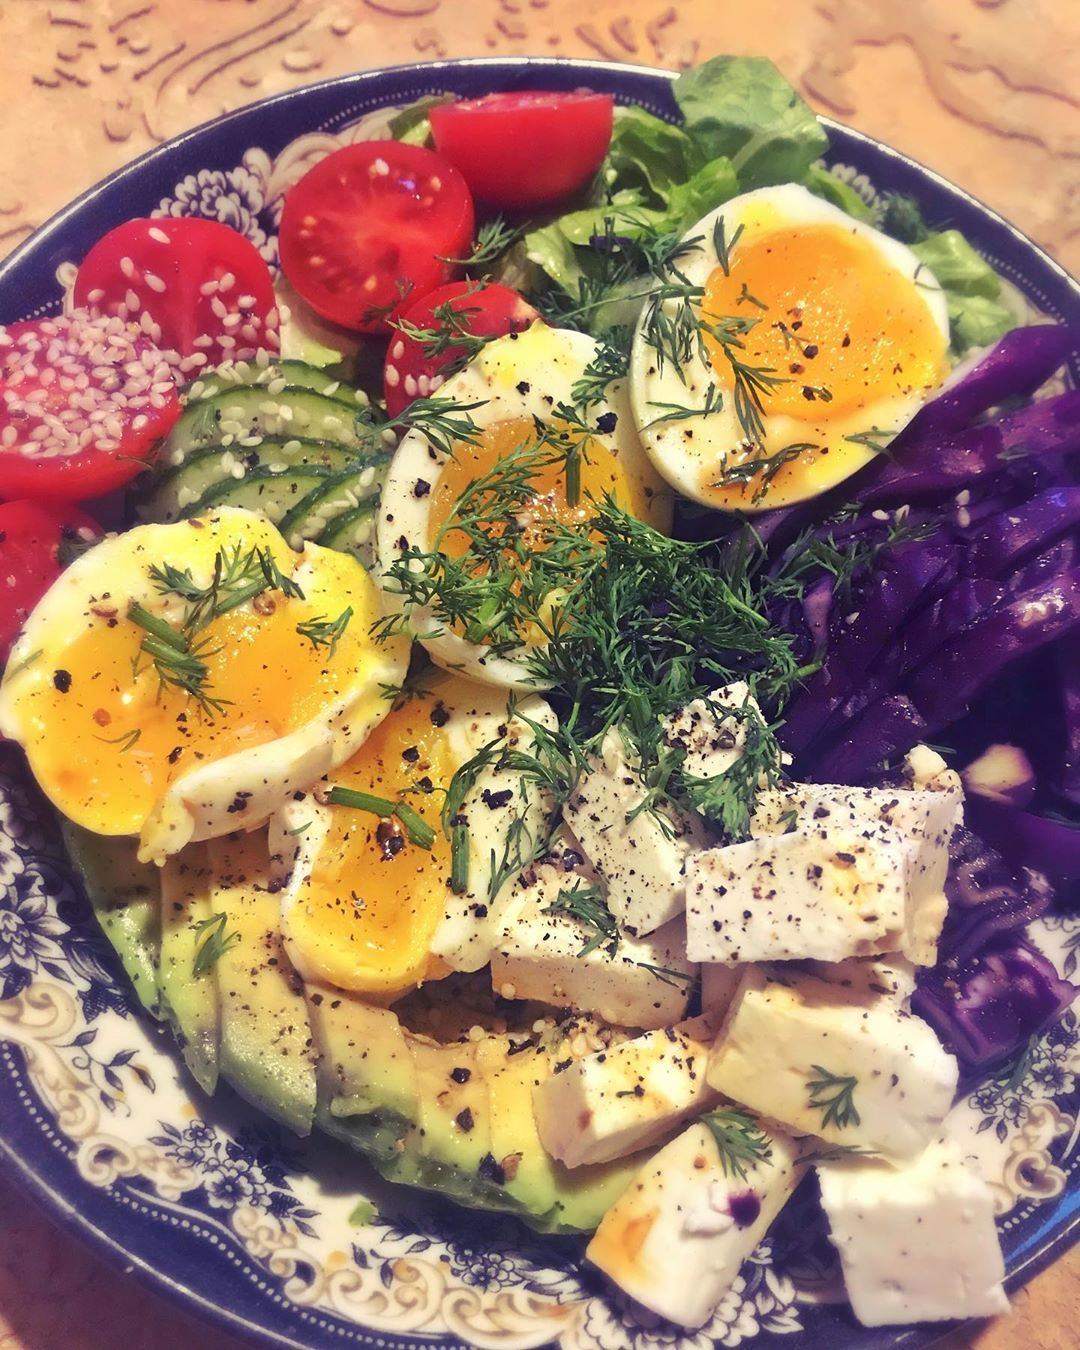 "Monika Prokopczyk on Instagram: ""Quick veggie dinner 🥑🥒🍅🥬🥗 😋  #vegetarian #vegetarianfood #food #healthyfood #foodie #wegetarianizm  #healthy #love #redcabbage #foodporn…"""